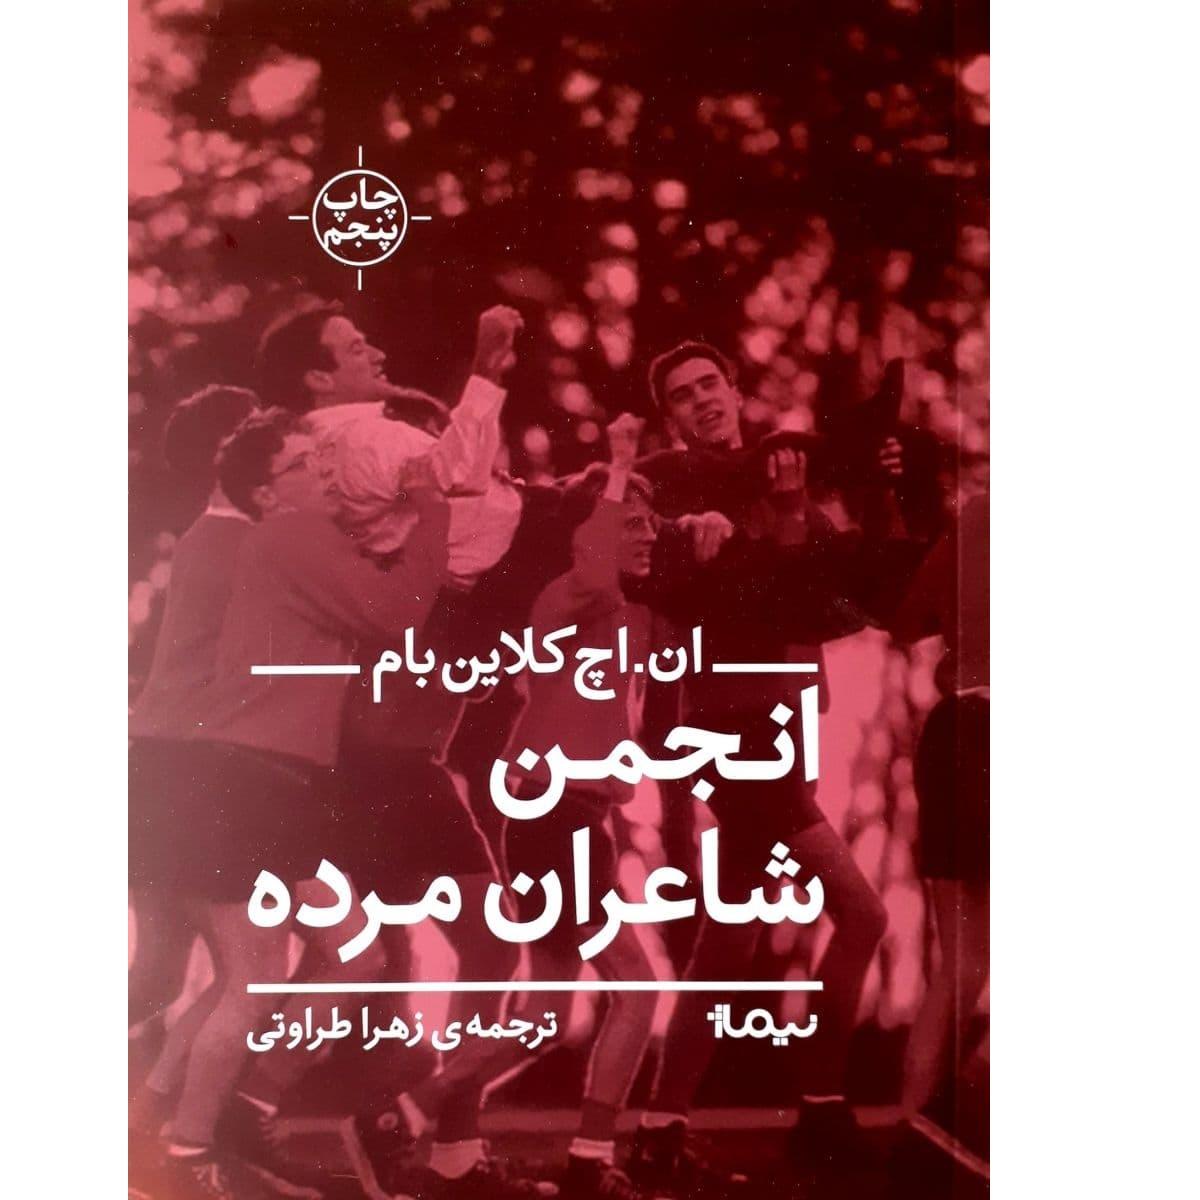 انجمن شاعران مرده اثر ان.اچ کلاین بام نشر نیماژ